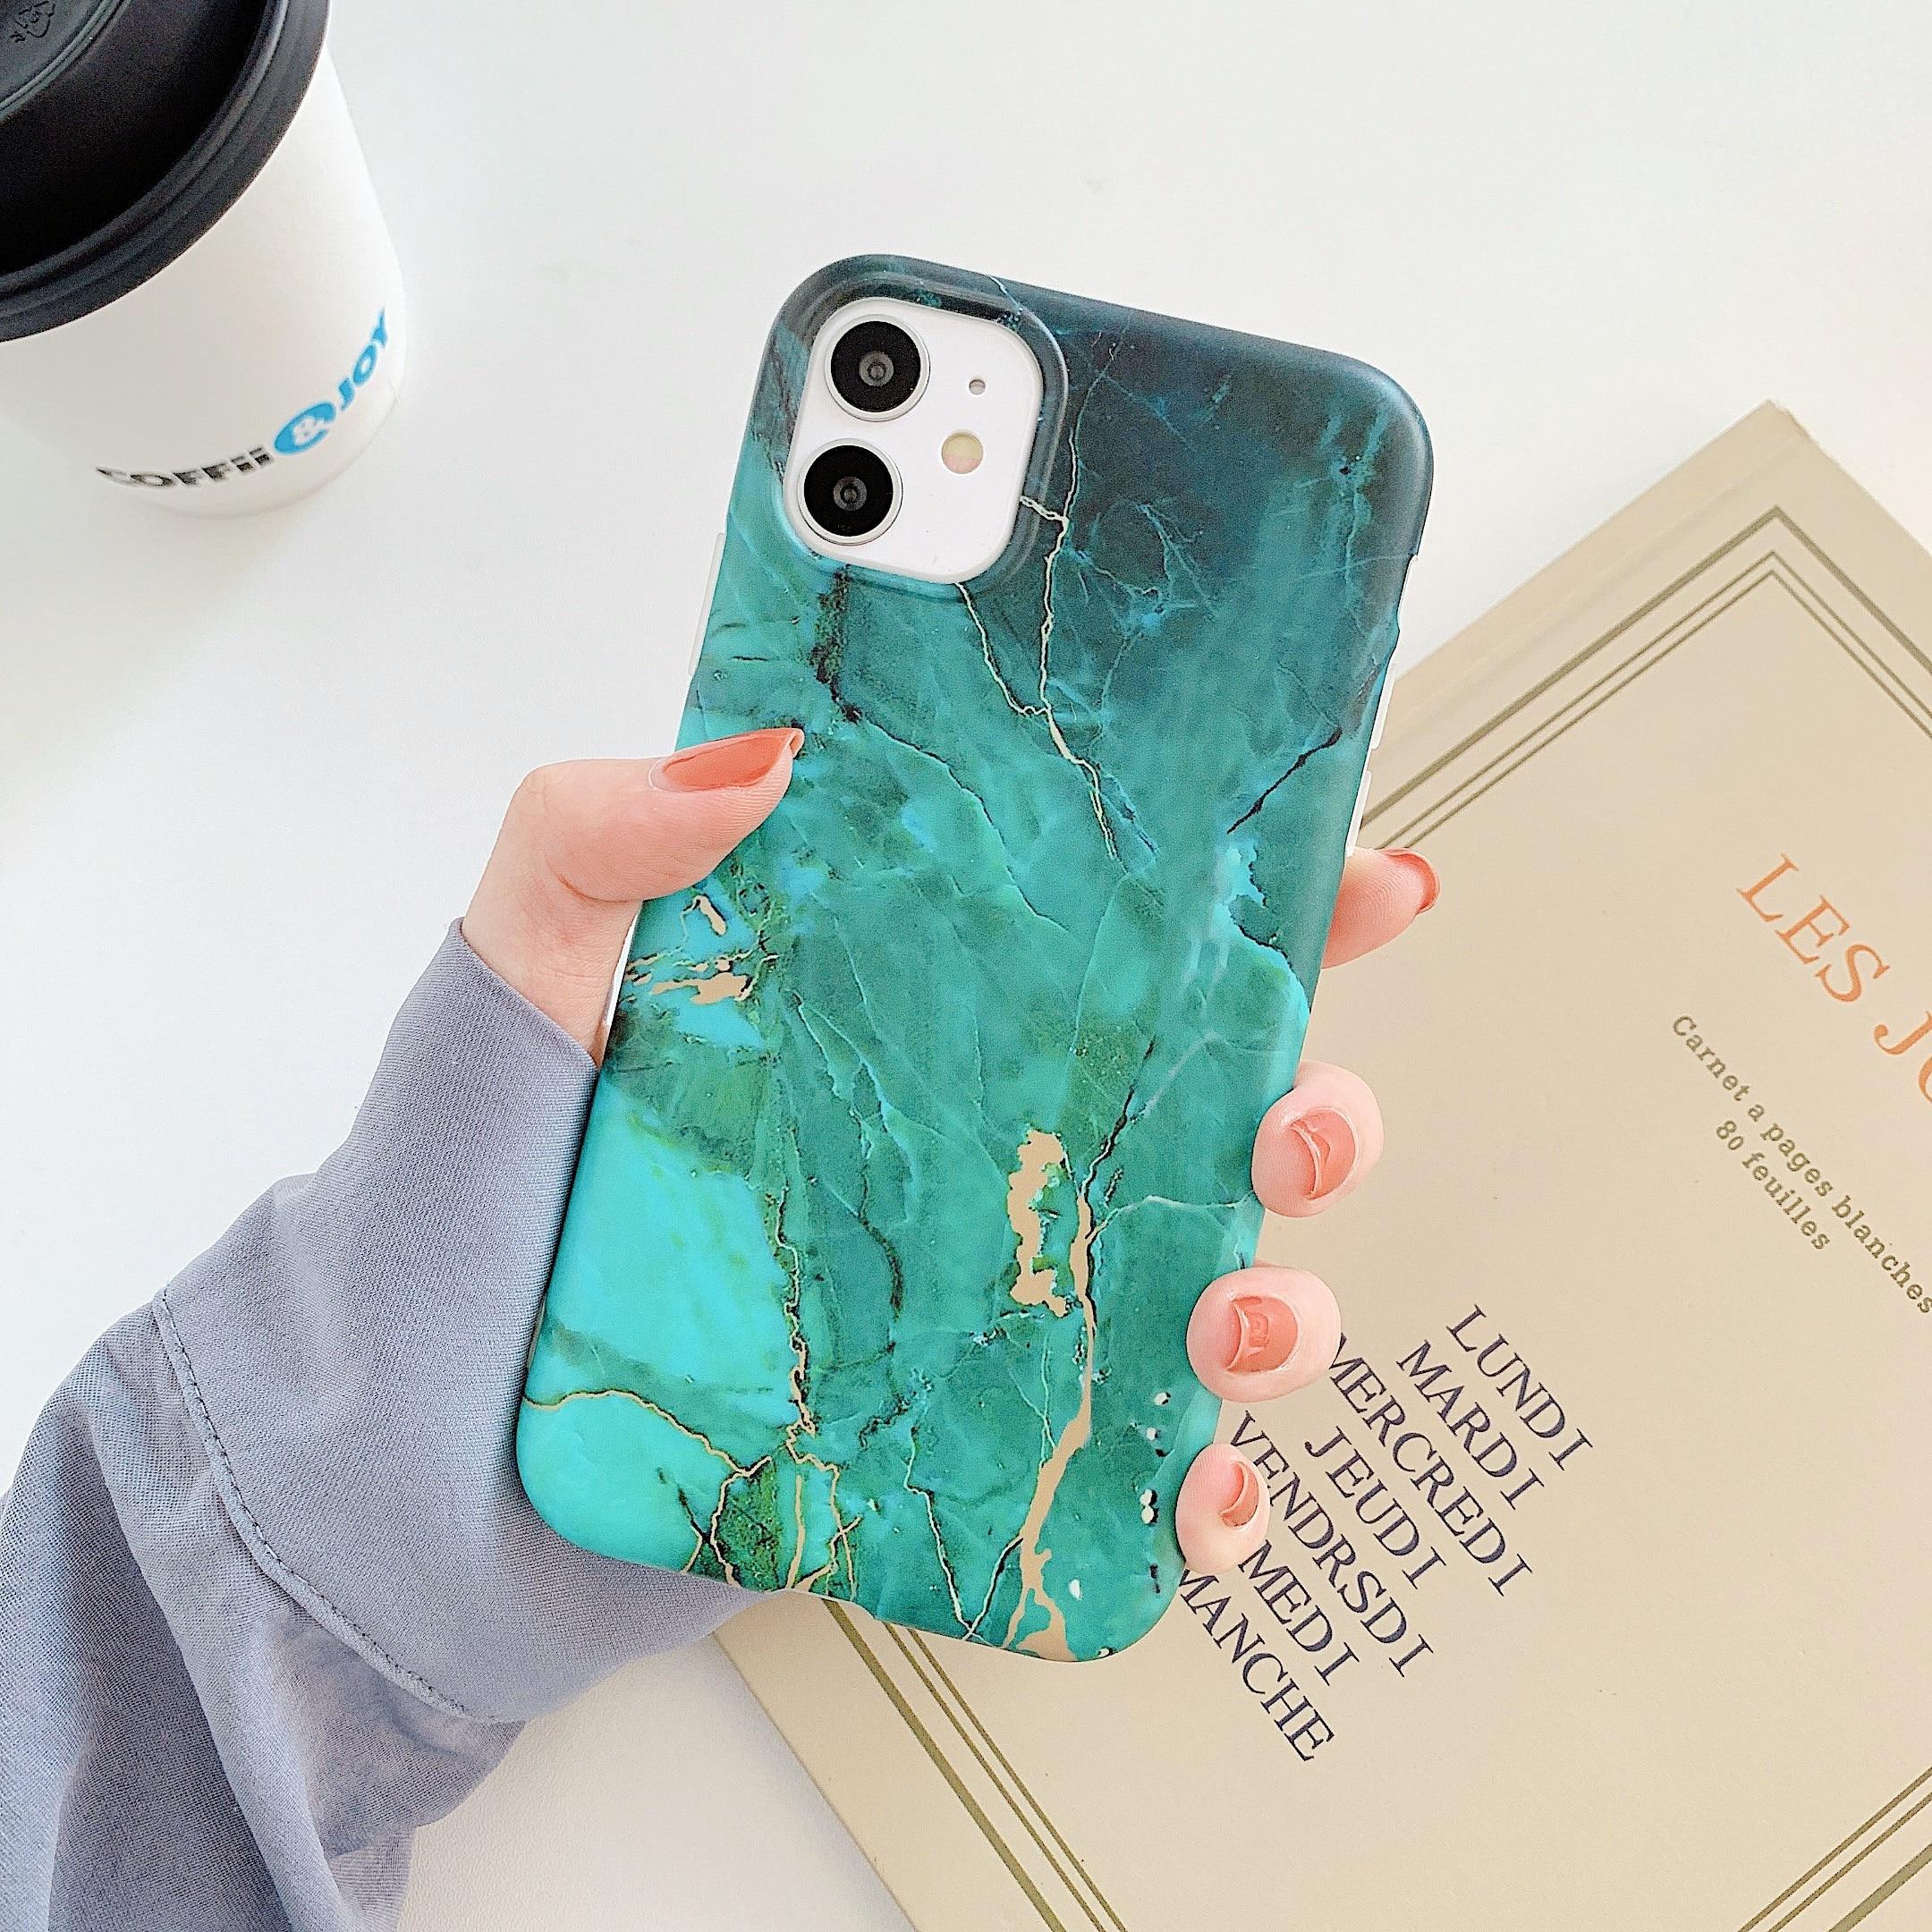 H97f768cfd6684a99b4a9bce2e4d9c4e4b Capinha celular case Mármore rachadura matte casos de telefone para iphone 12 mini 11 pro max se 2020 xs max xr x 7 8 plus capa de silicone macio tpu imd volta